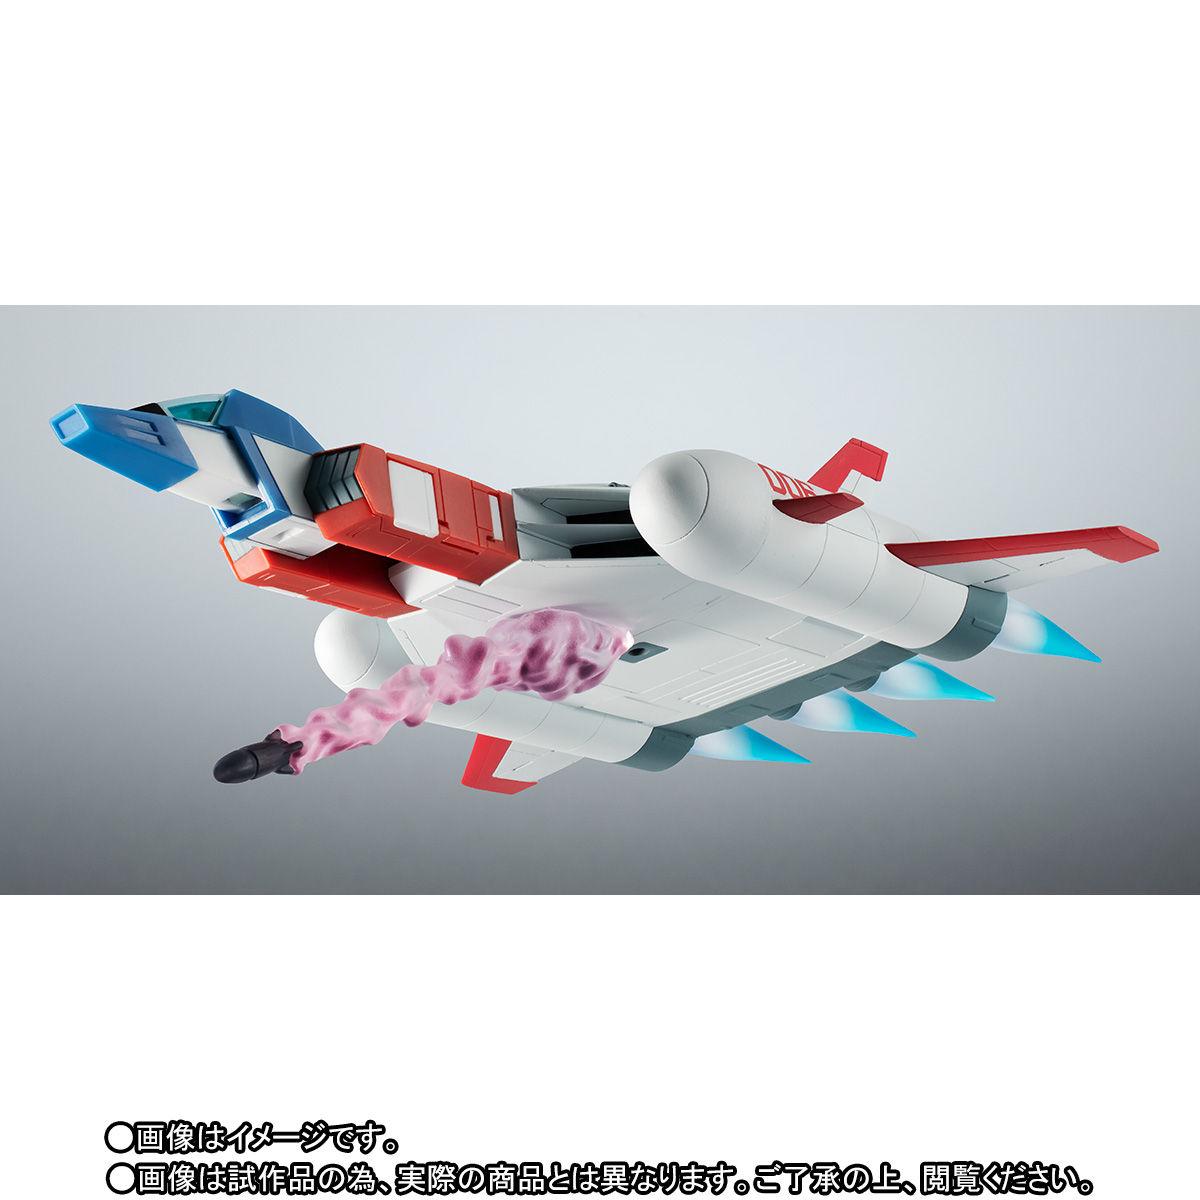 ROBOT魂〈SIDE MS〉『FF-X7-Bst コア・ブースター 2機セット ver. A.N.I.M.E. ~スレッガー005 & セイラ006~』機動戦士ガンダム 可動フィギュア-003